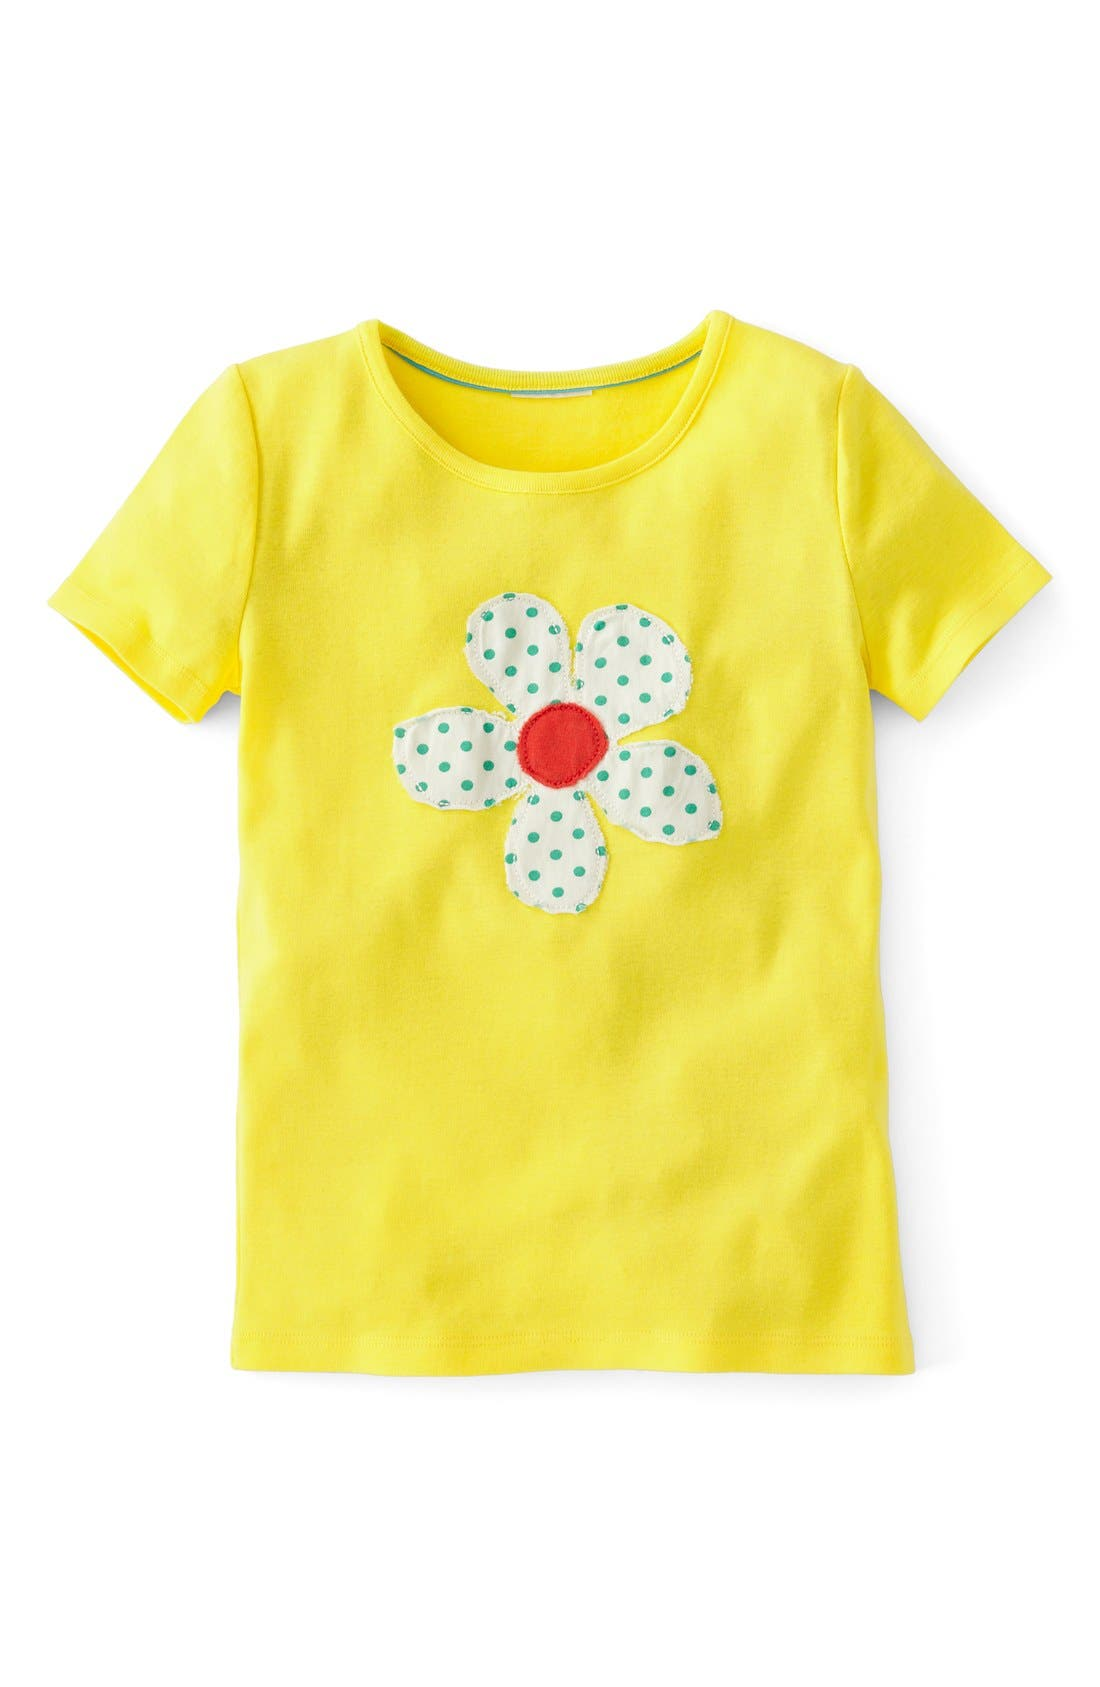 Alternate Image 1 Selected - Mini Boden 'Dotty' Appliqué Tee (Toddler Girls, Little Girls & Big Girls)